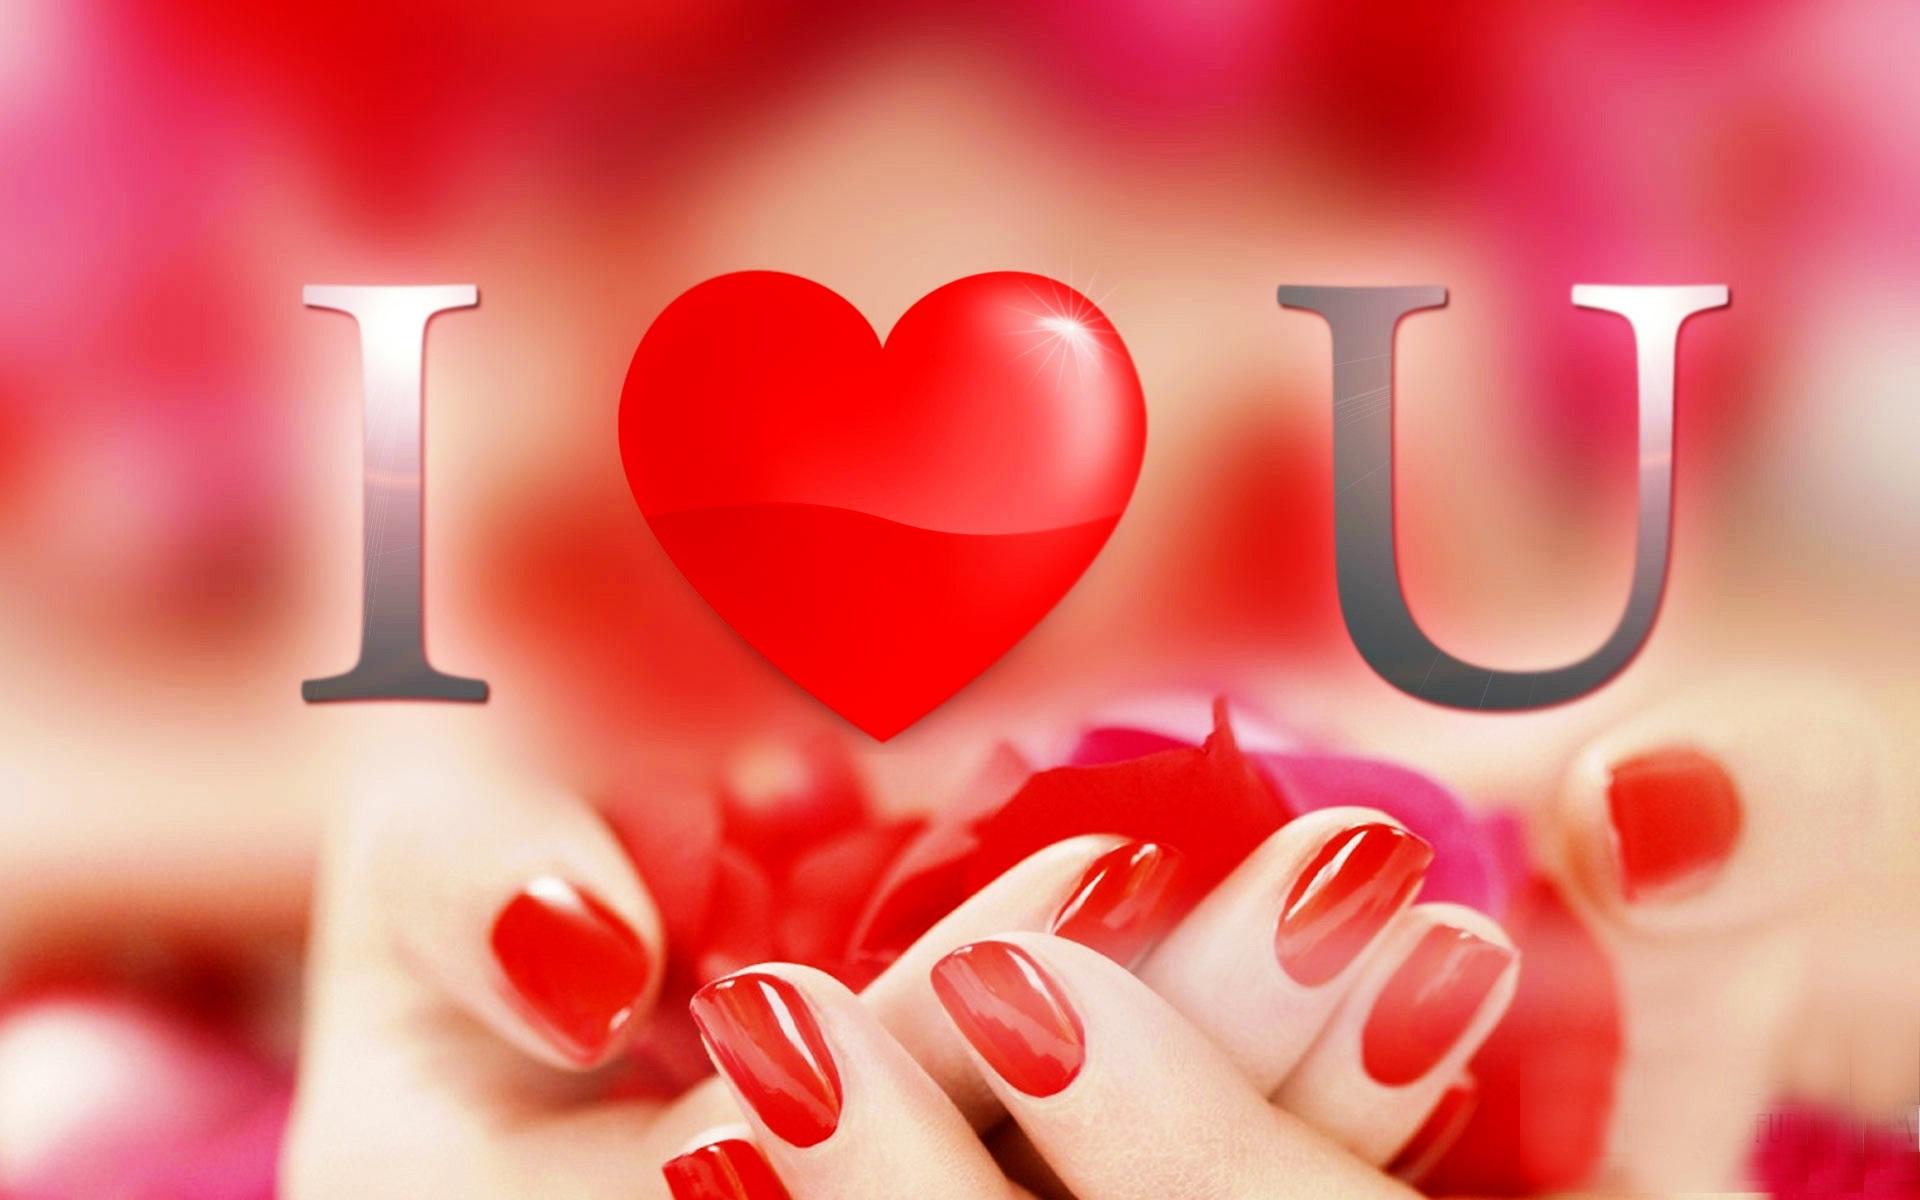 بالصور صور اجمل صور غرام احدث صور عشق , صورة قلوب وكلمات حب 4266 2